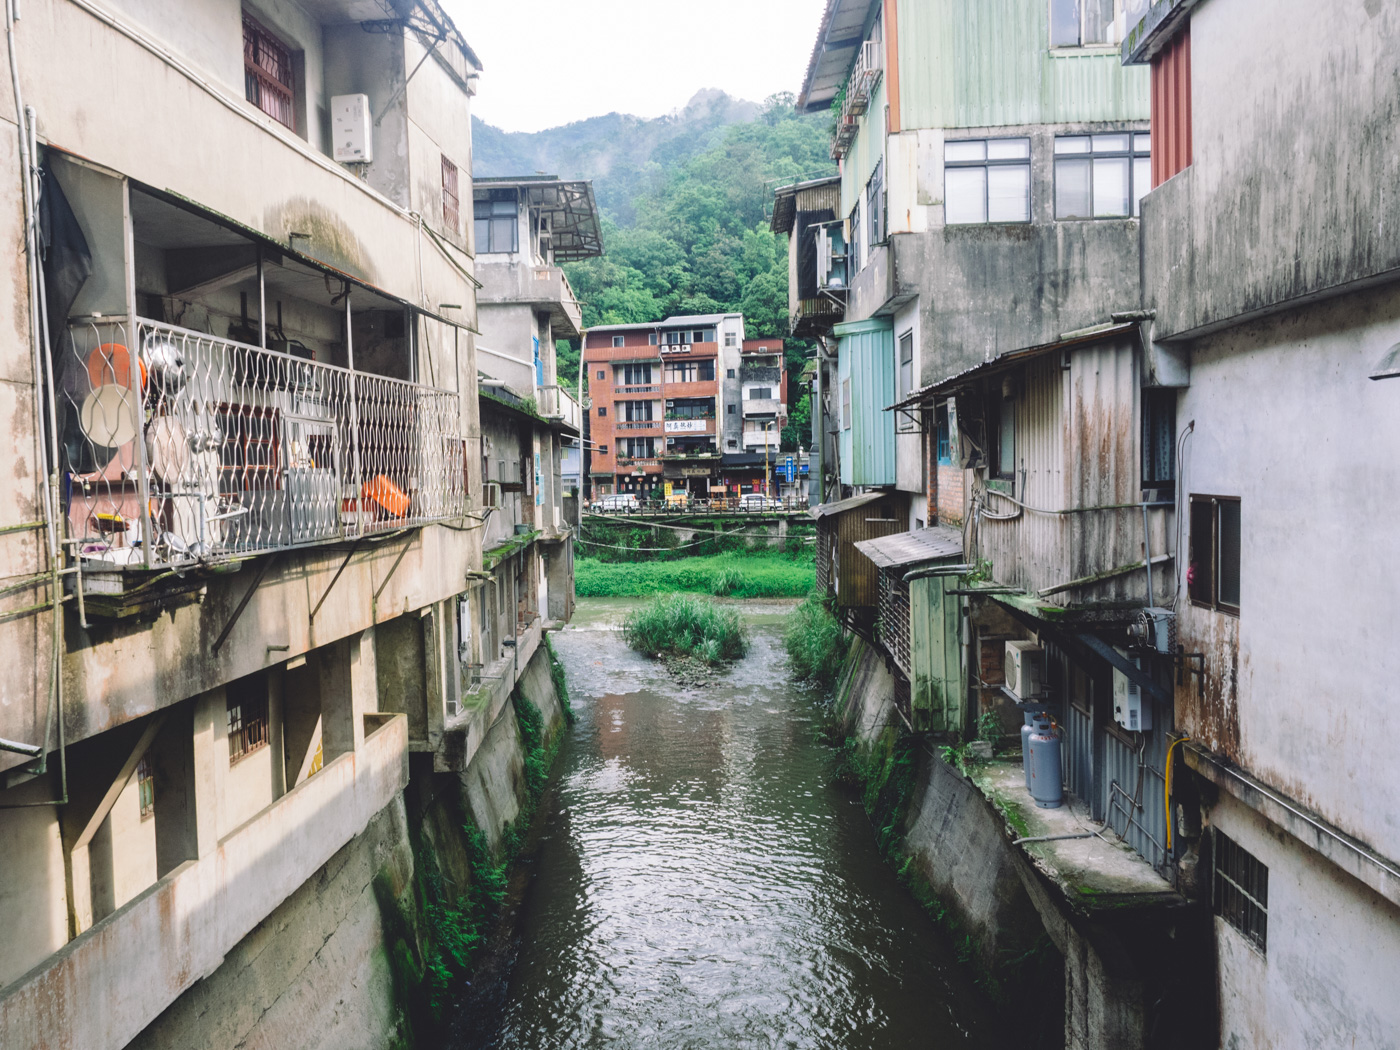 Taiwan - Shifen - Houses among the river bank